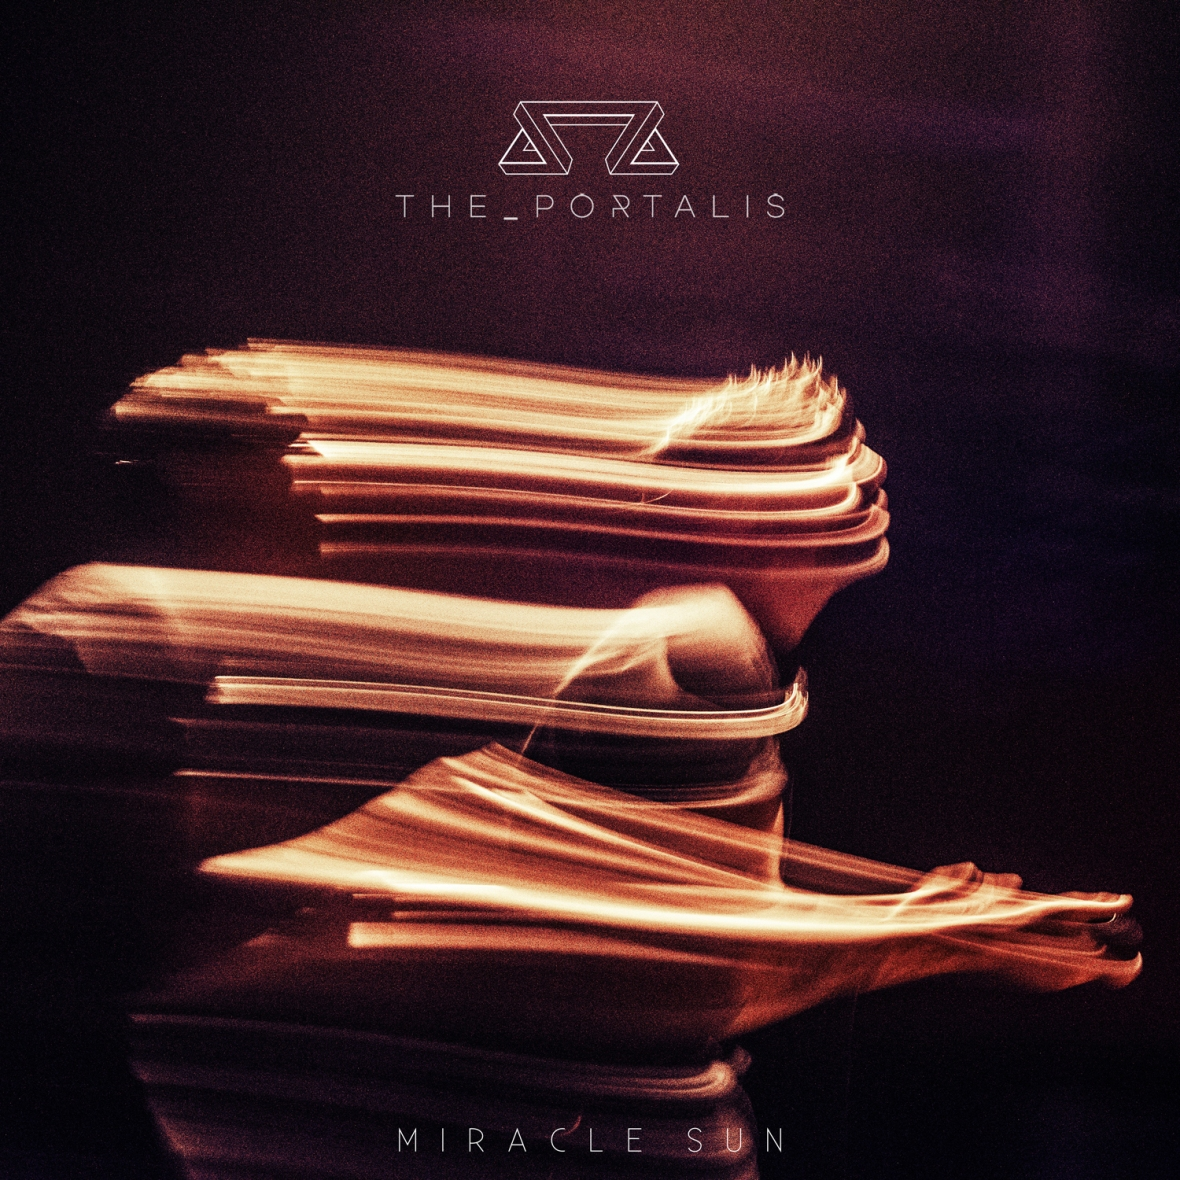 The Portalis : Miracle Sun